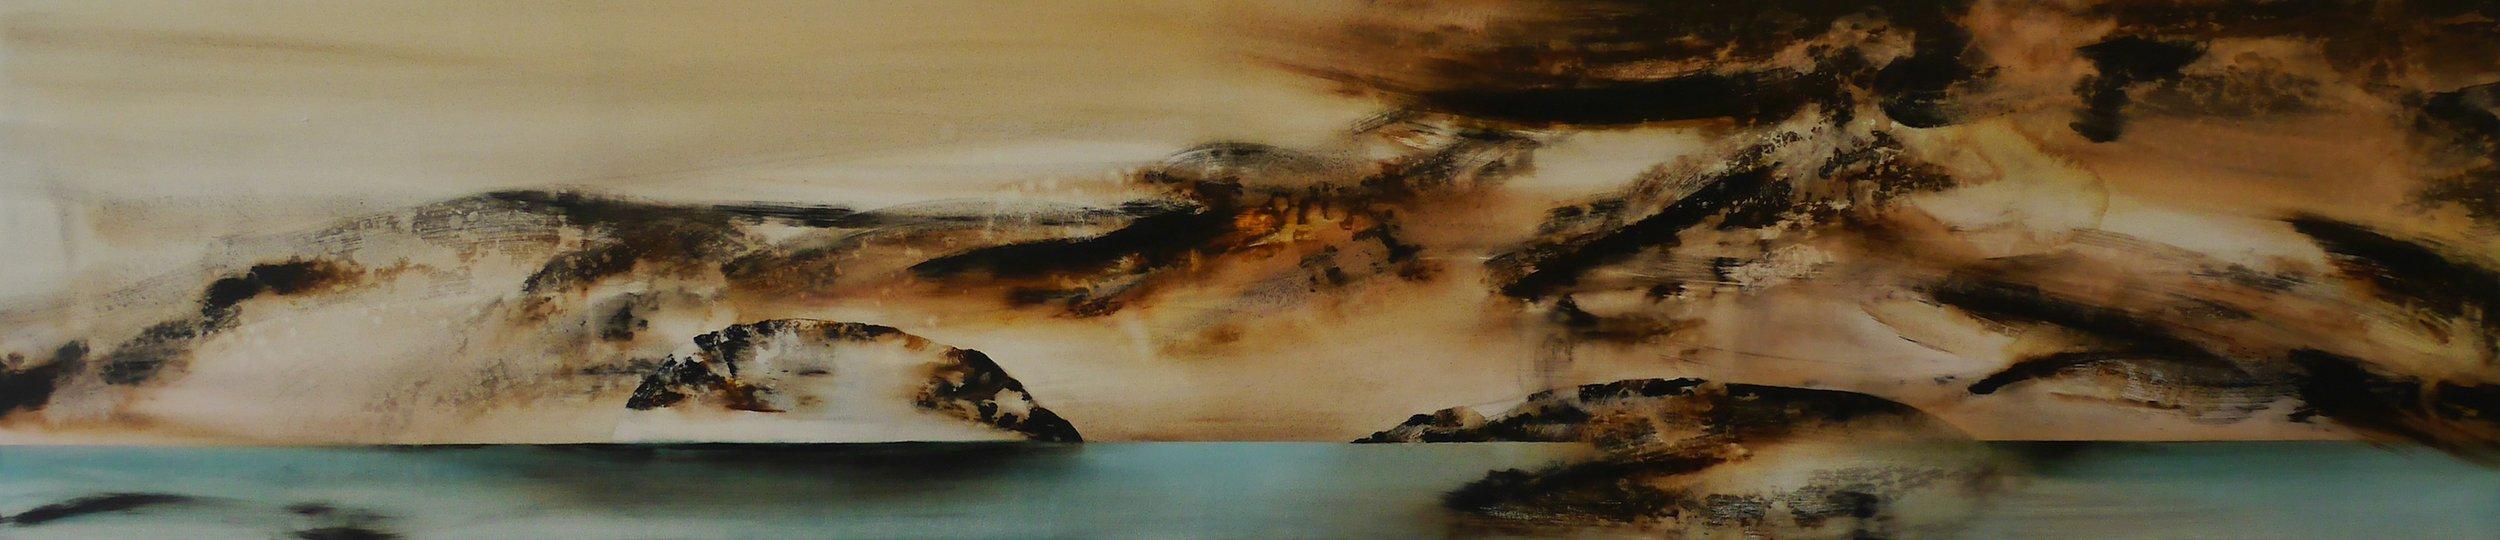 Wyn-Lyn TAN  In(visible) Horizons I  2017 Acrylic on canvas H54 x W245 x D2 cm